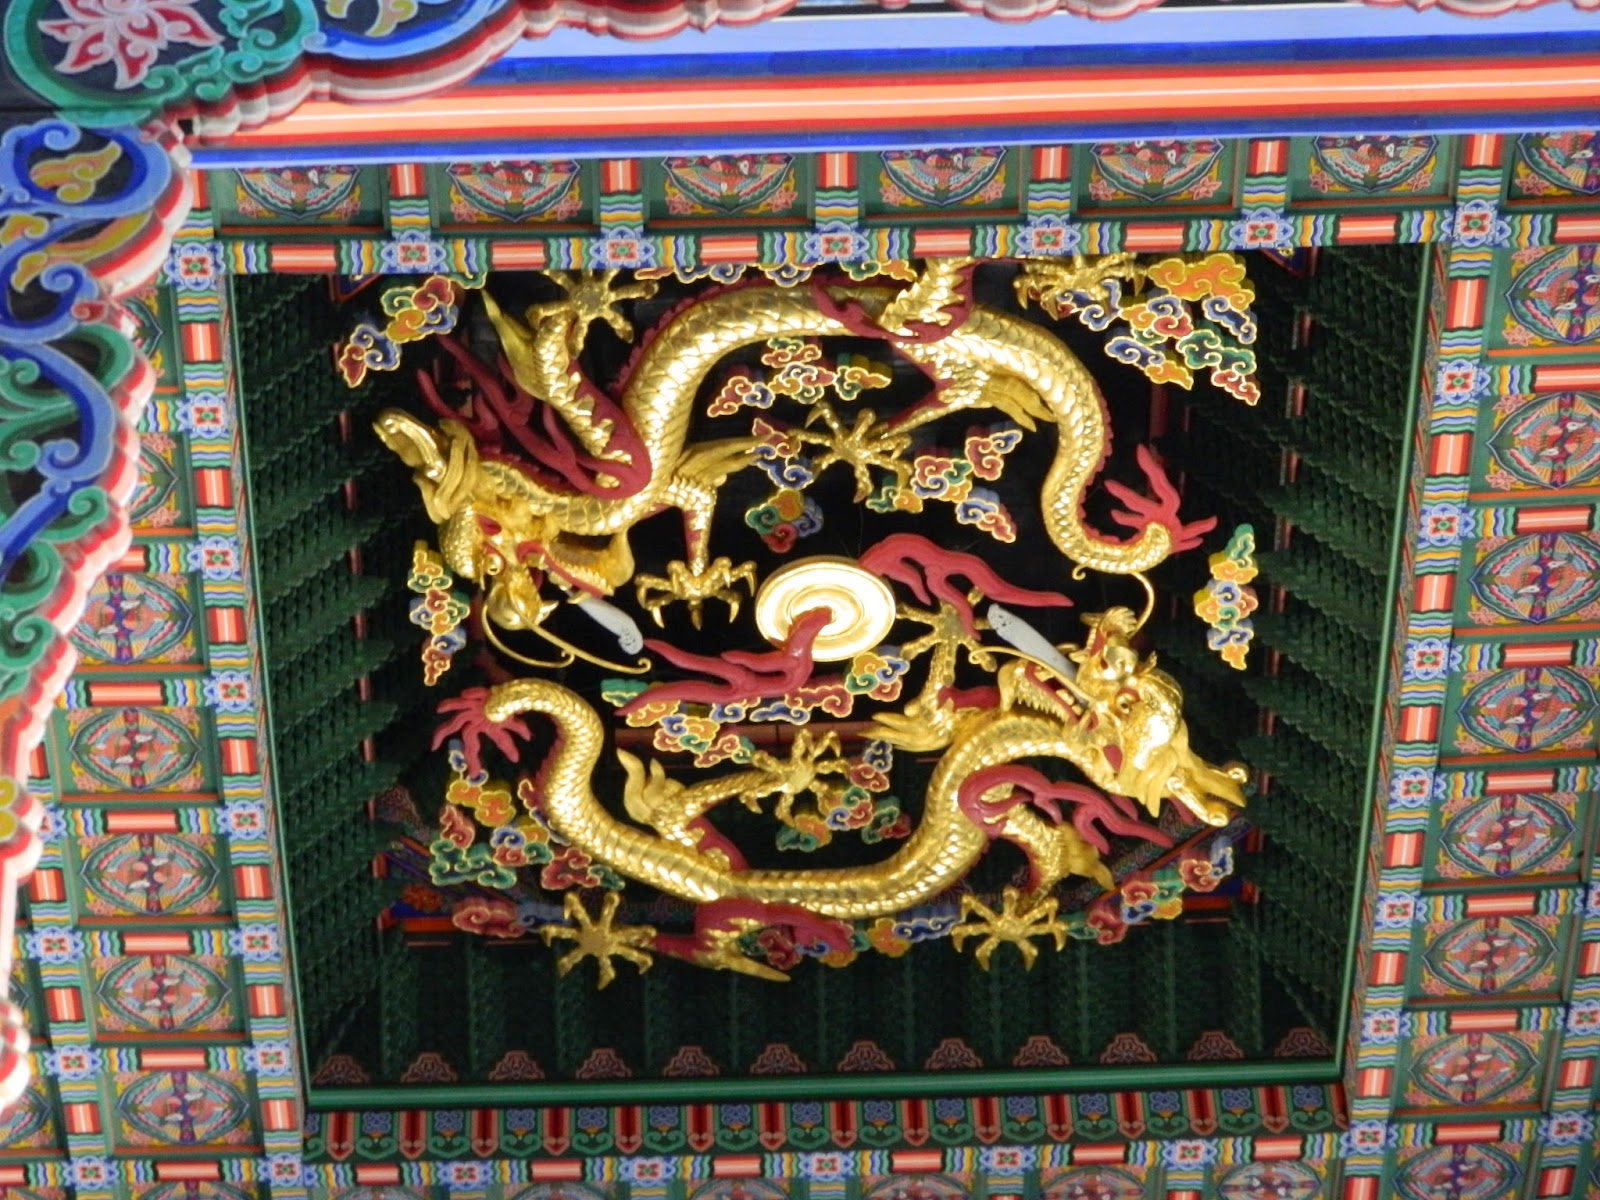 The golden dragon, symbol of good luck at Gyeongbokgung